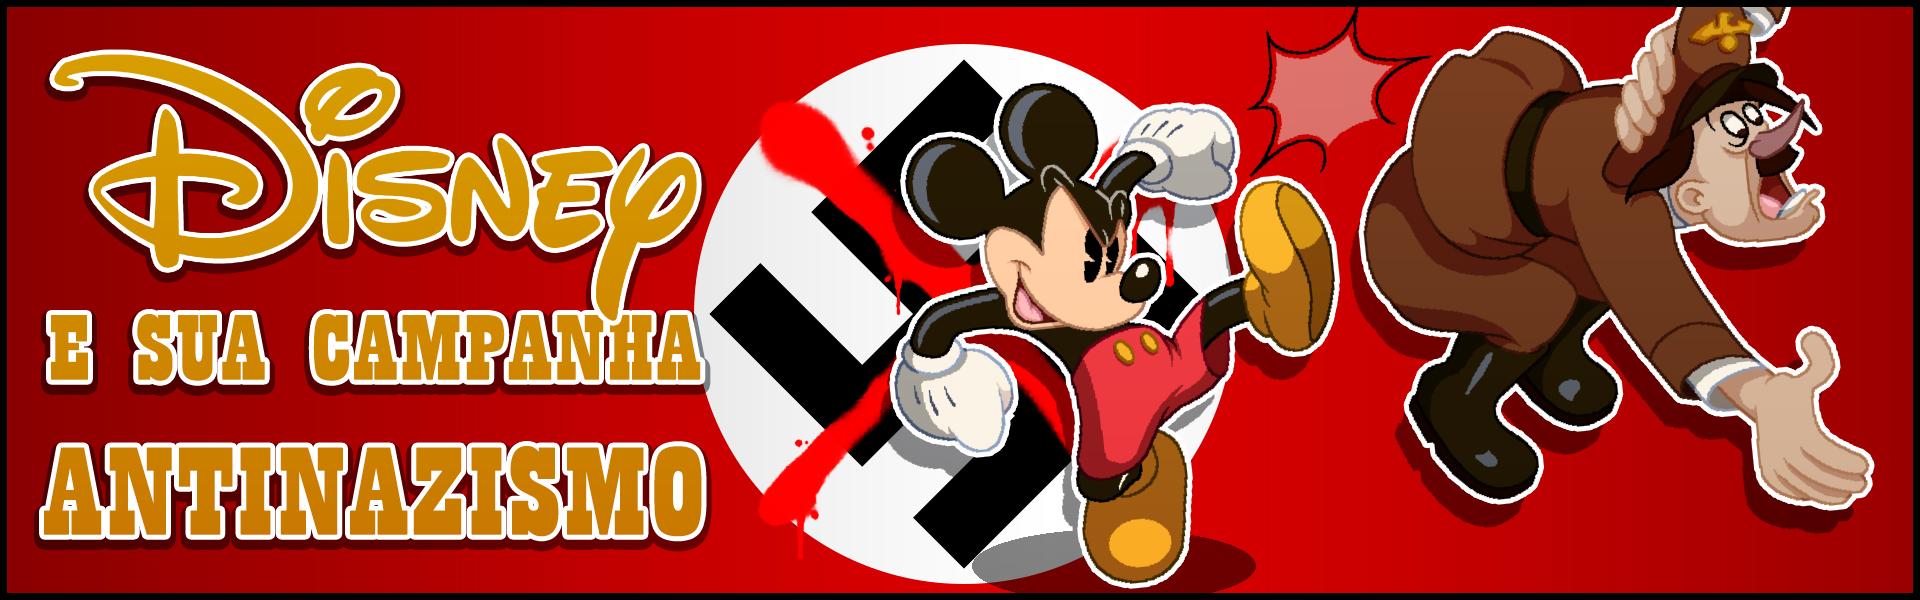 Disney e o Antinazismo